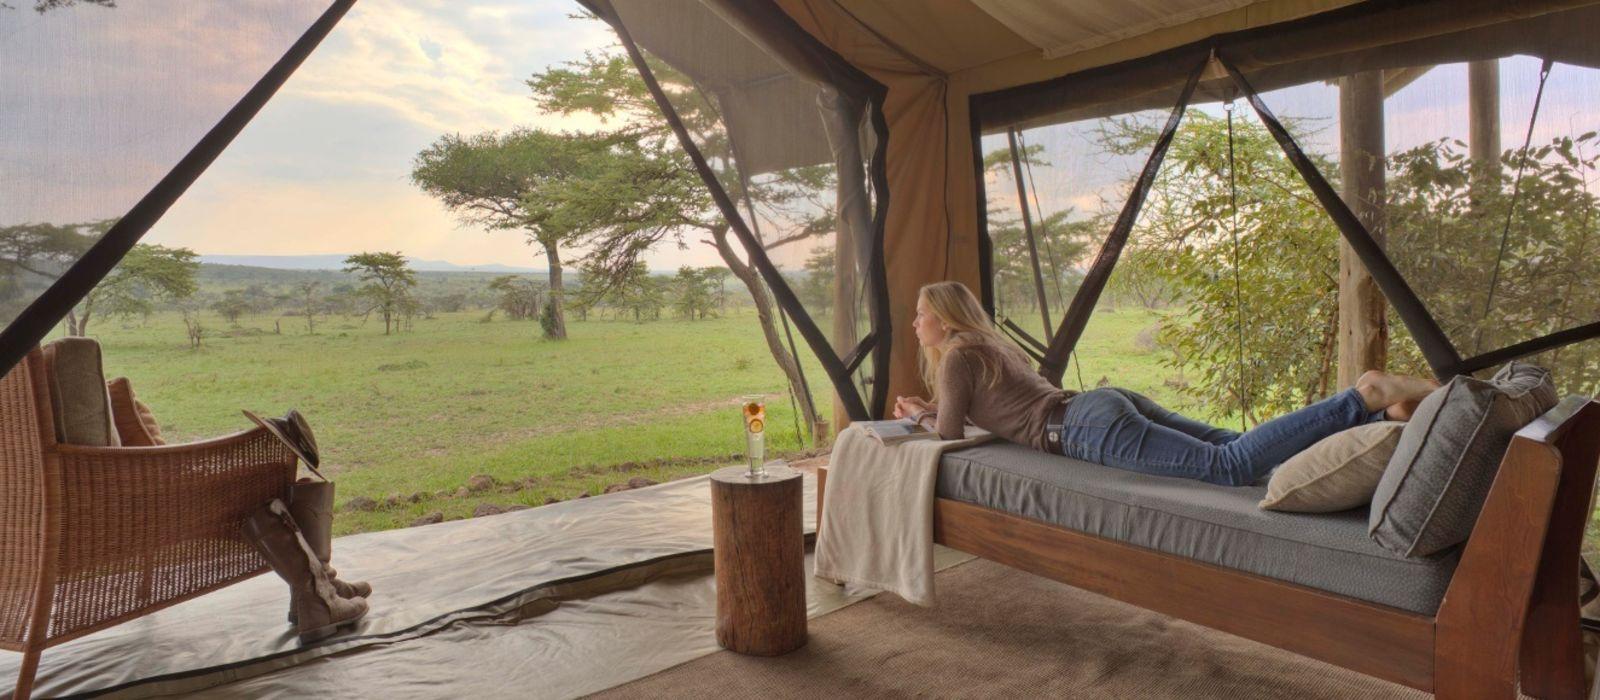 Kenia – Safari und Baden: Masai Mara & Traumstrände Urlaub 7